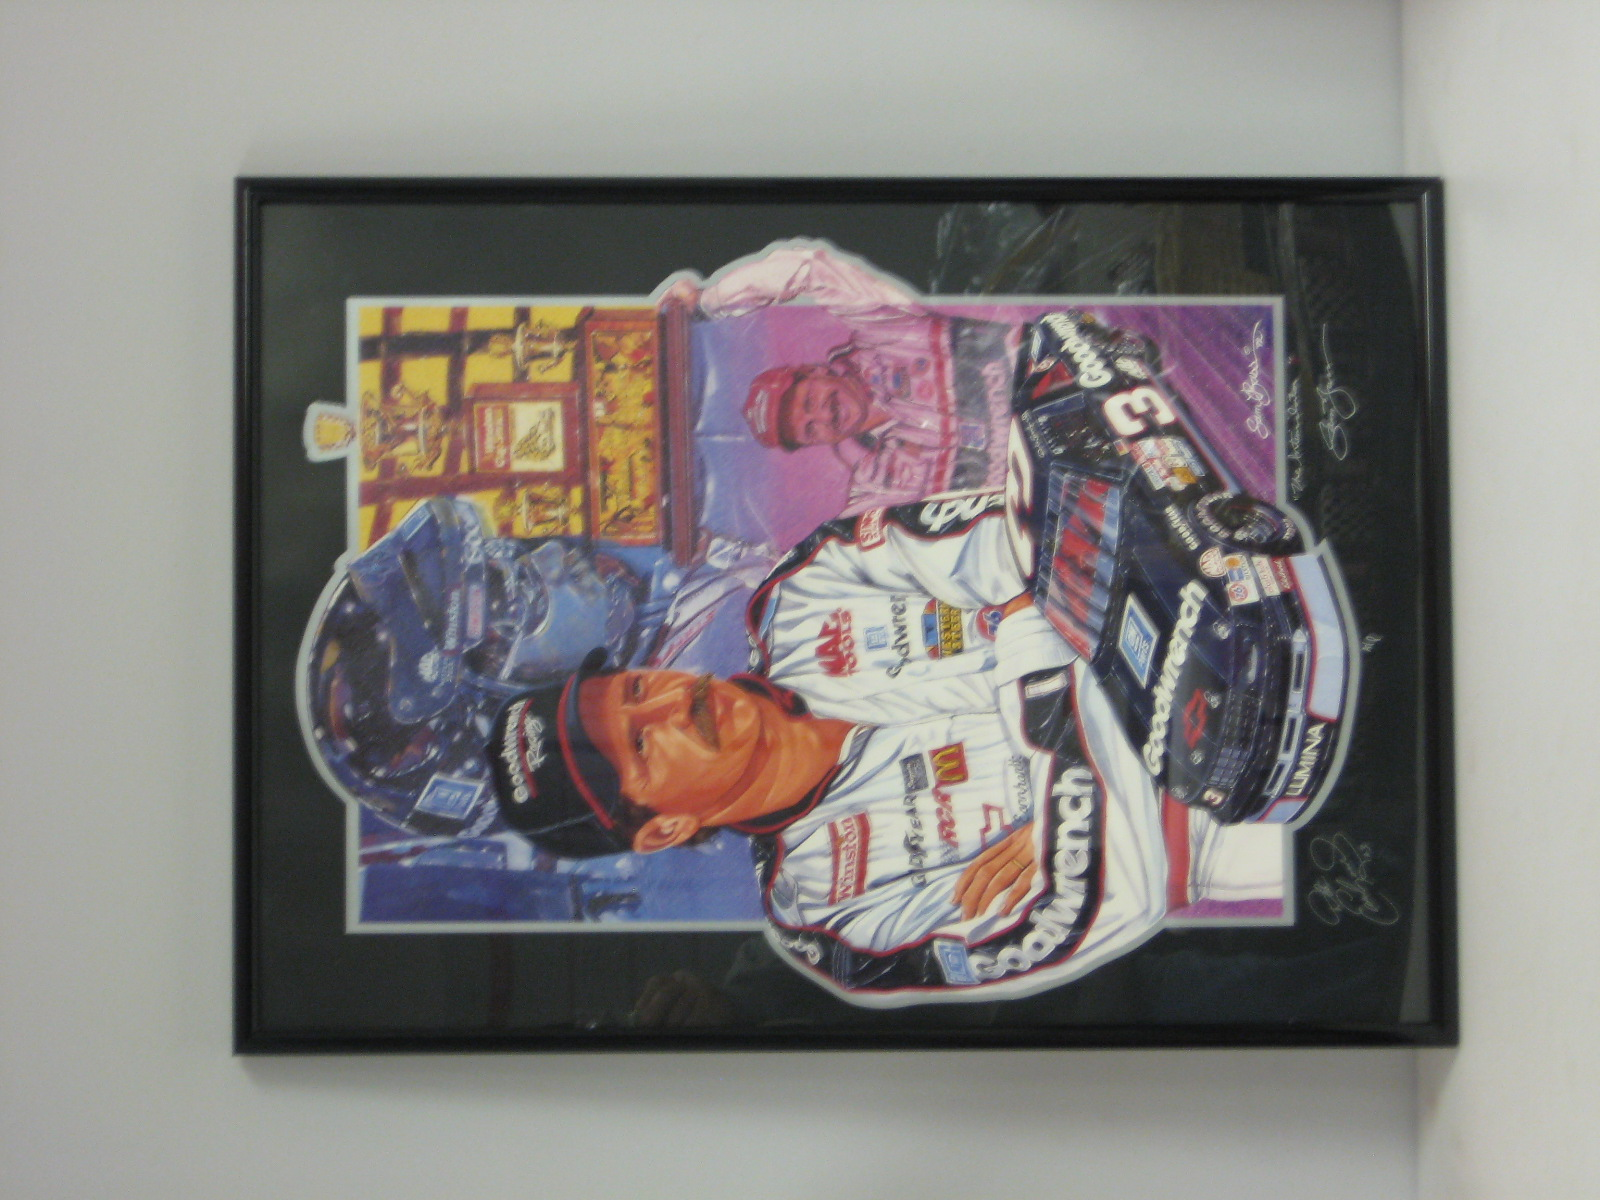 Custom Framed Dale Earnhardt The Intimidator Print